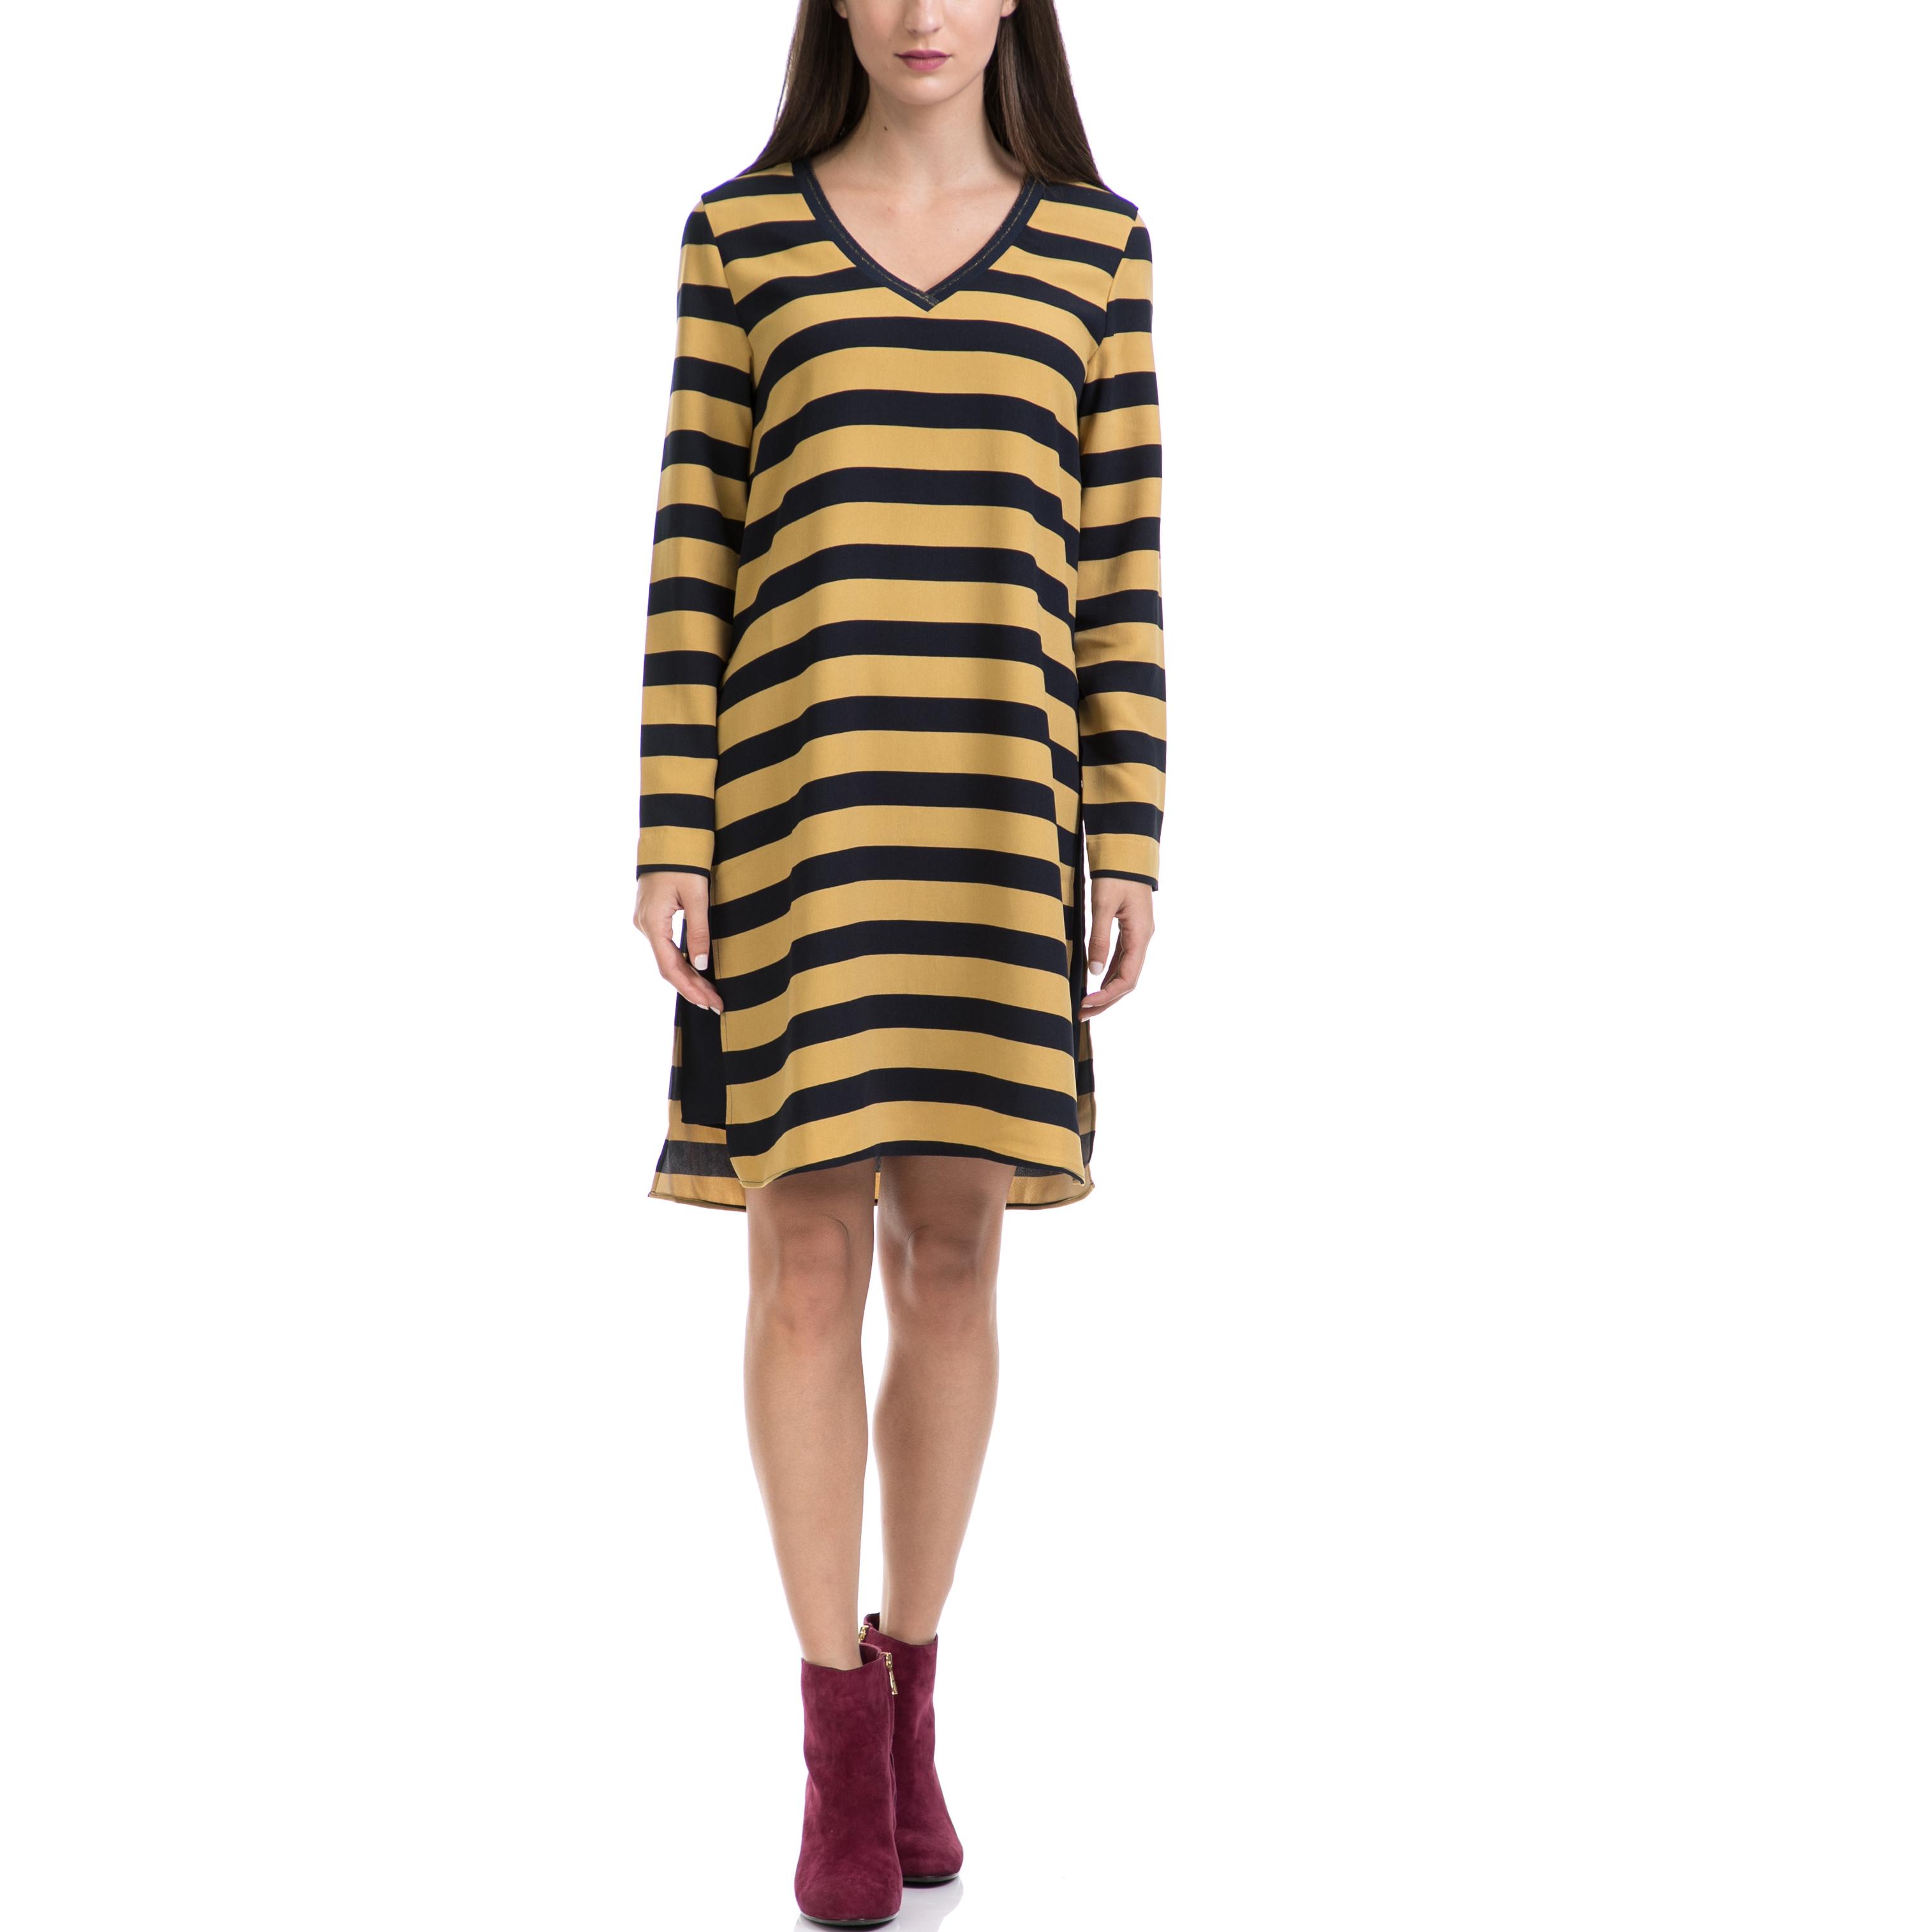 MAISON SCOTCH - Γυναικείο φόρεμα MAISON SCOTCH μαύρο-κίτρινο γυναικεία ρούχα φορέματα μέχρι το γόνατο